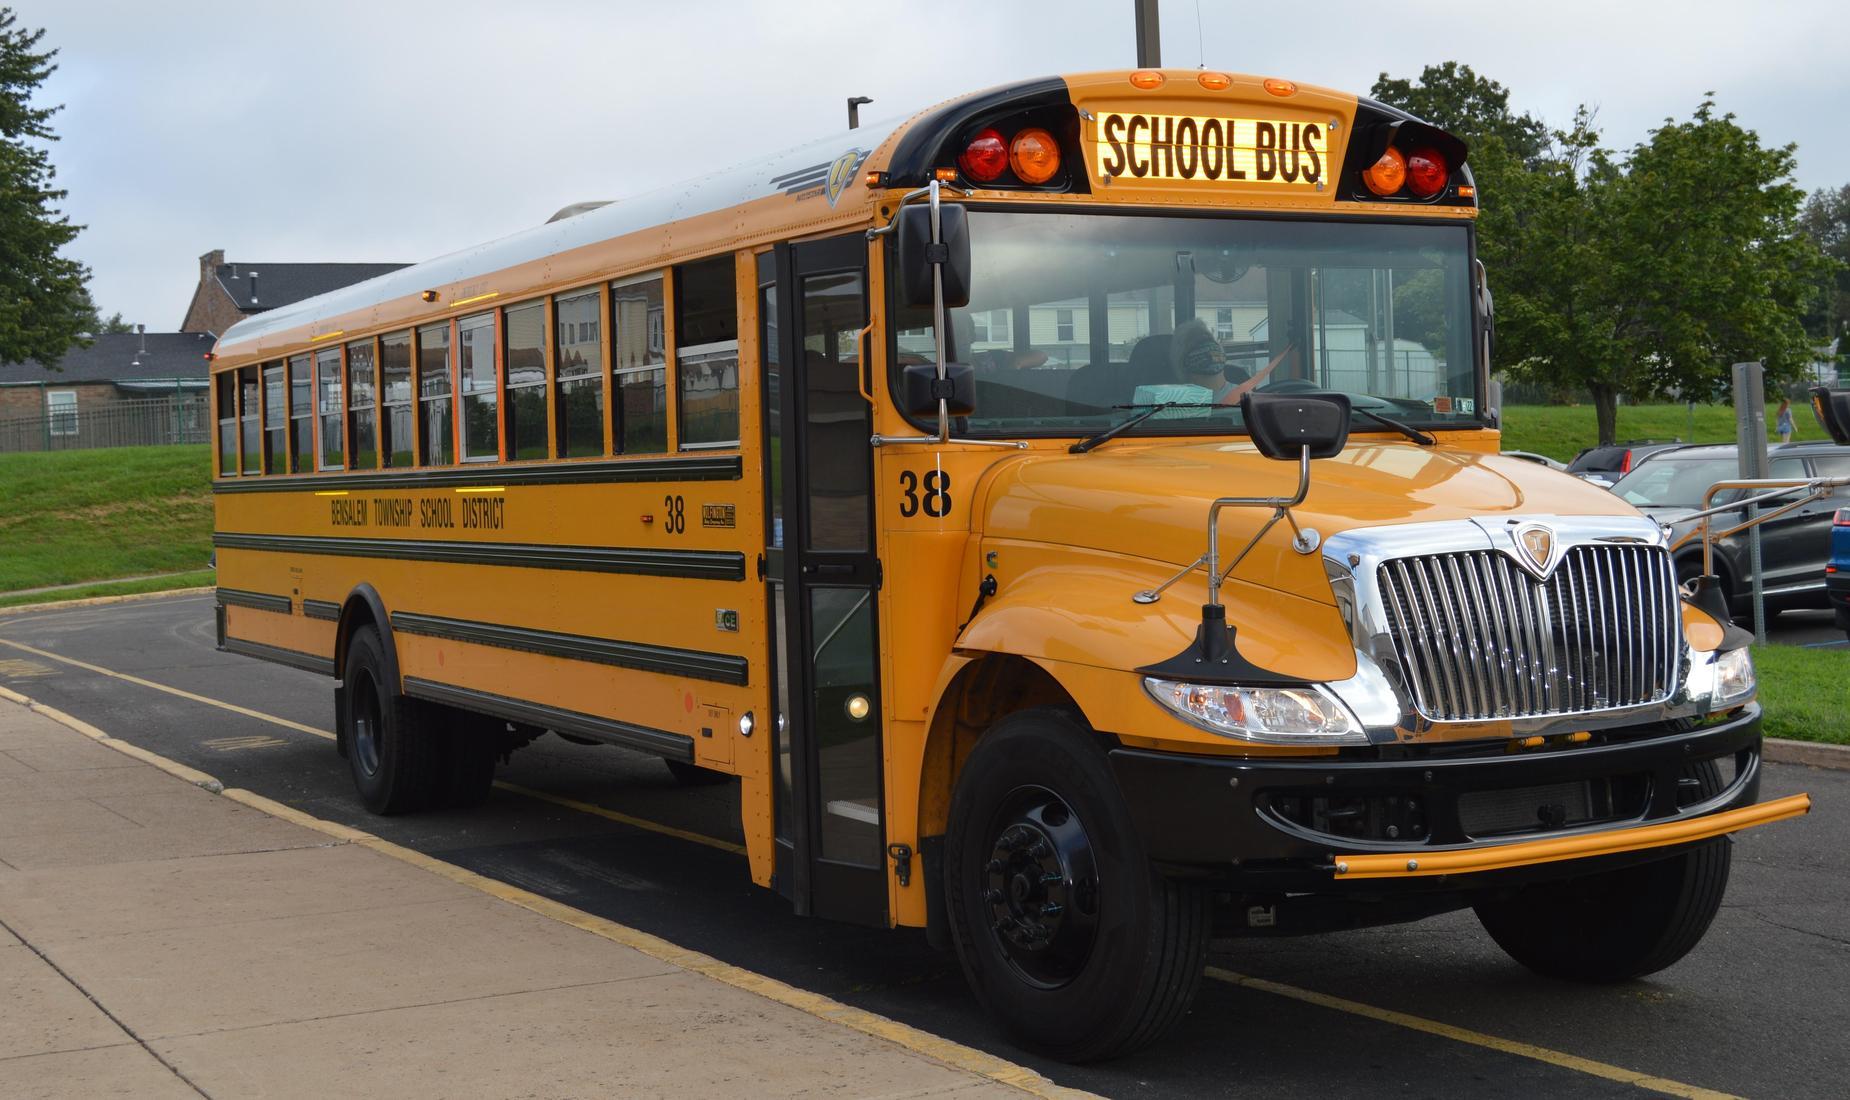 Bensalem yellow school bus #38